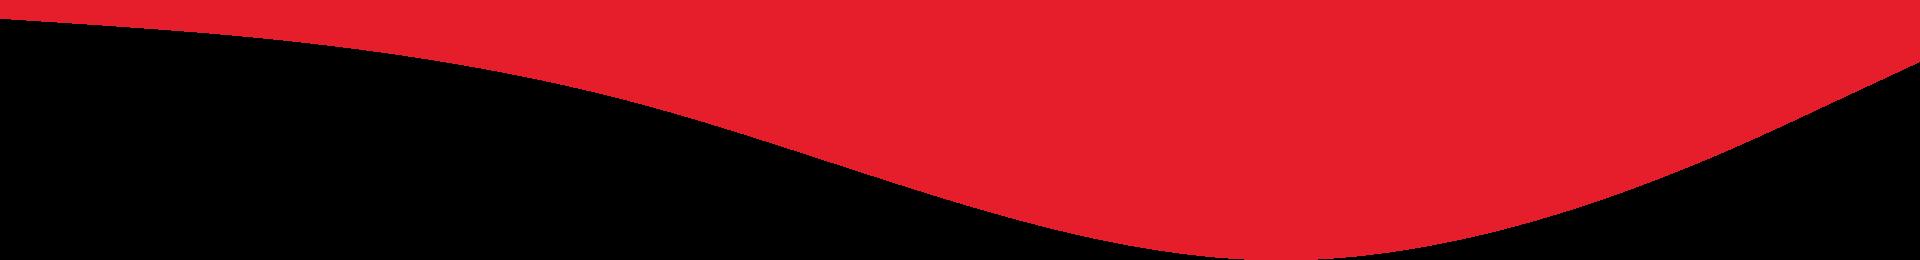 strishe e kuqe coca-cola